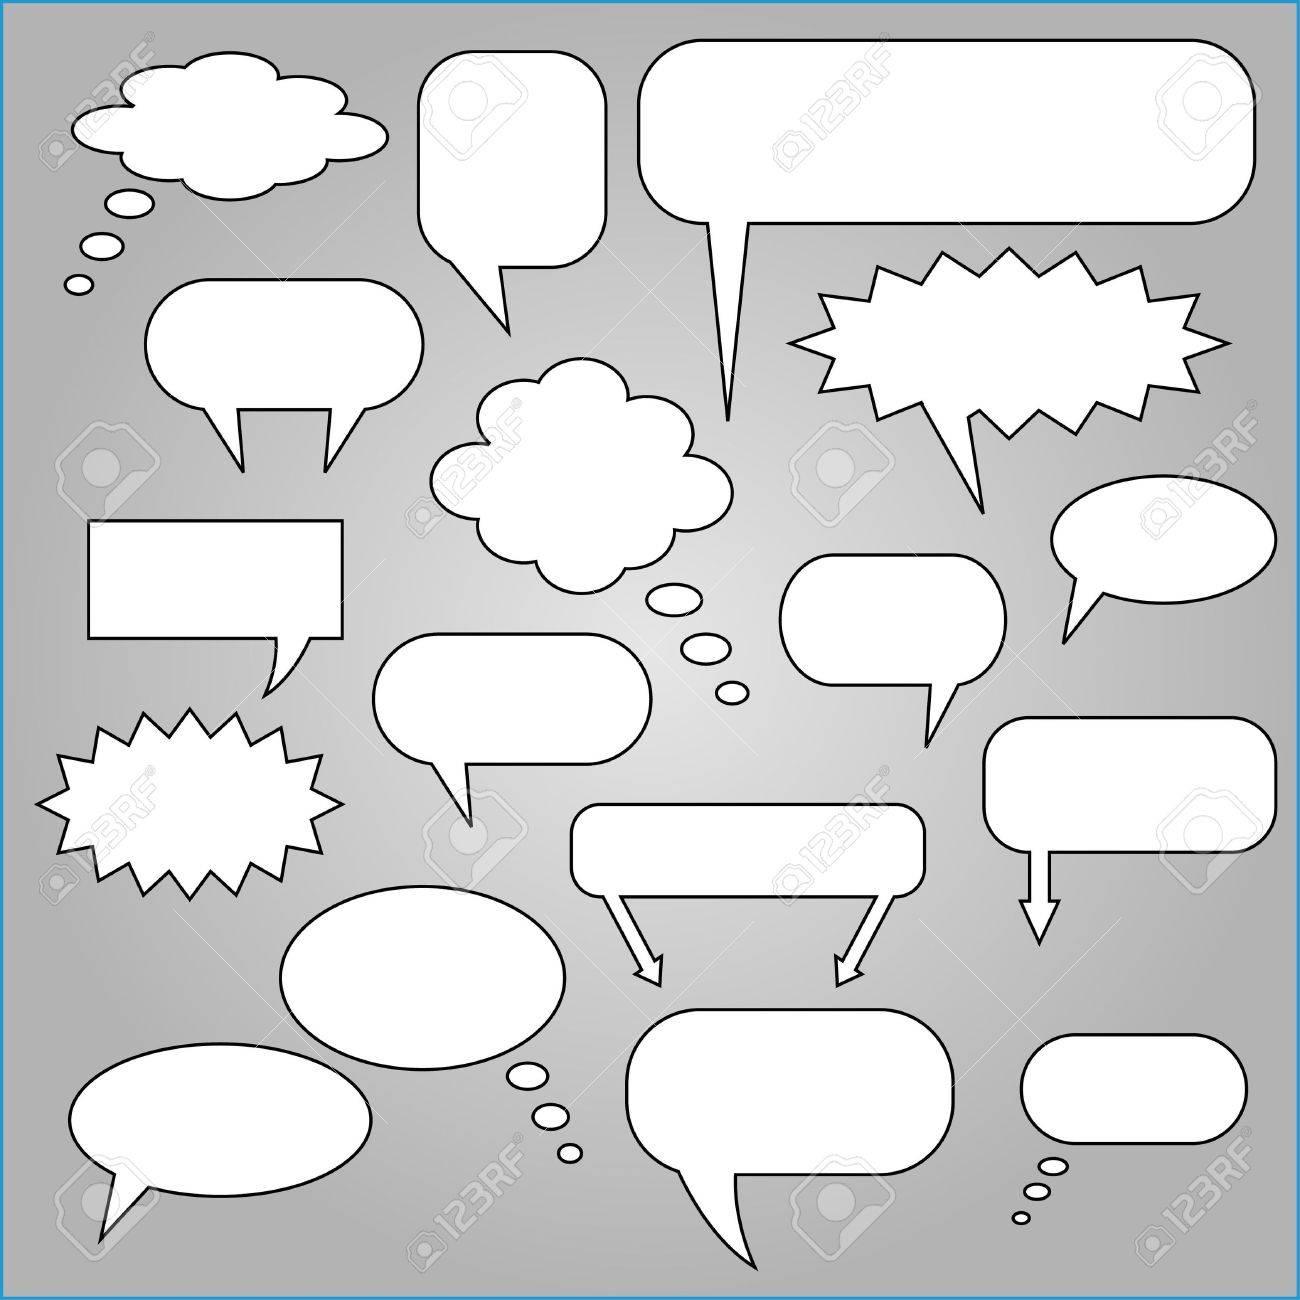 Comic Speech Chat Bubbles Stock Vector - 7253168